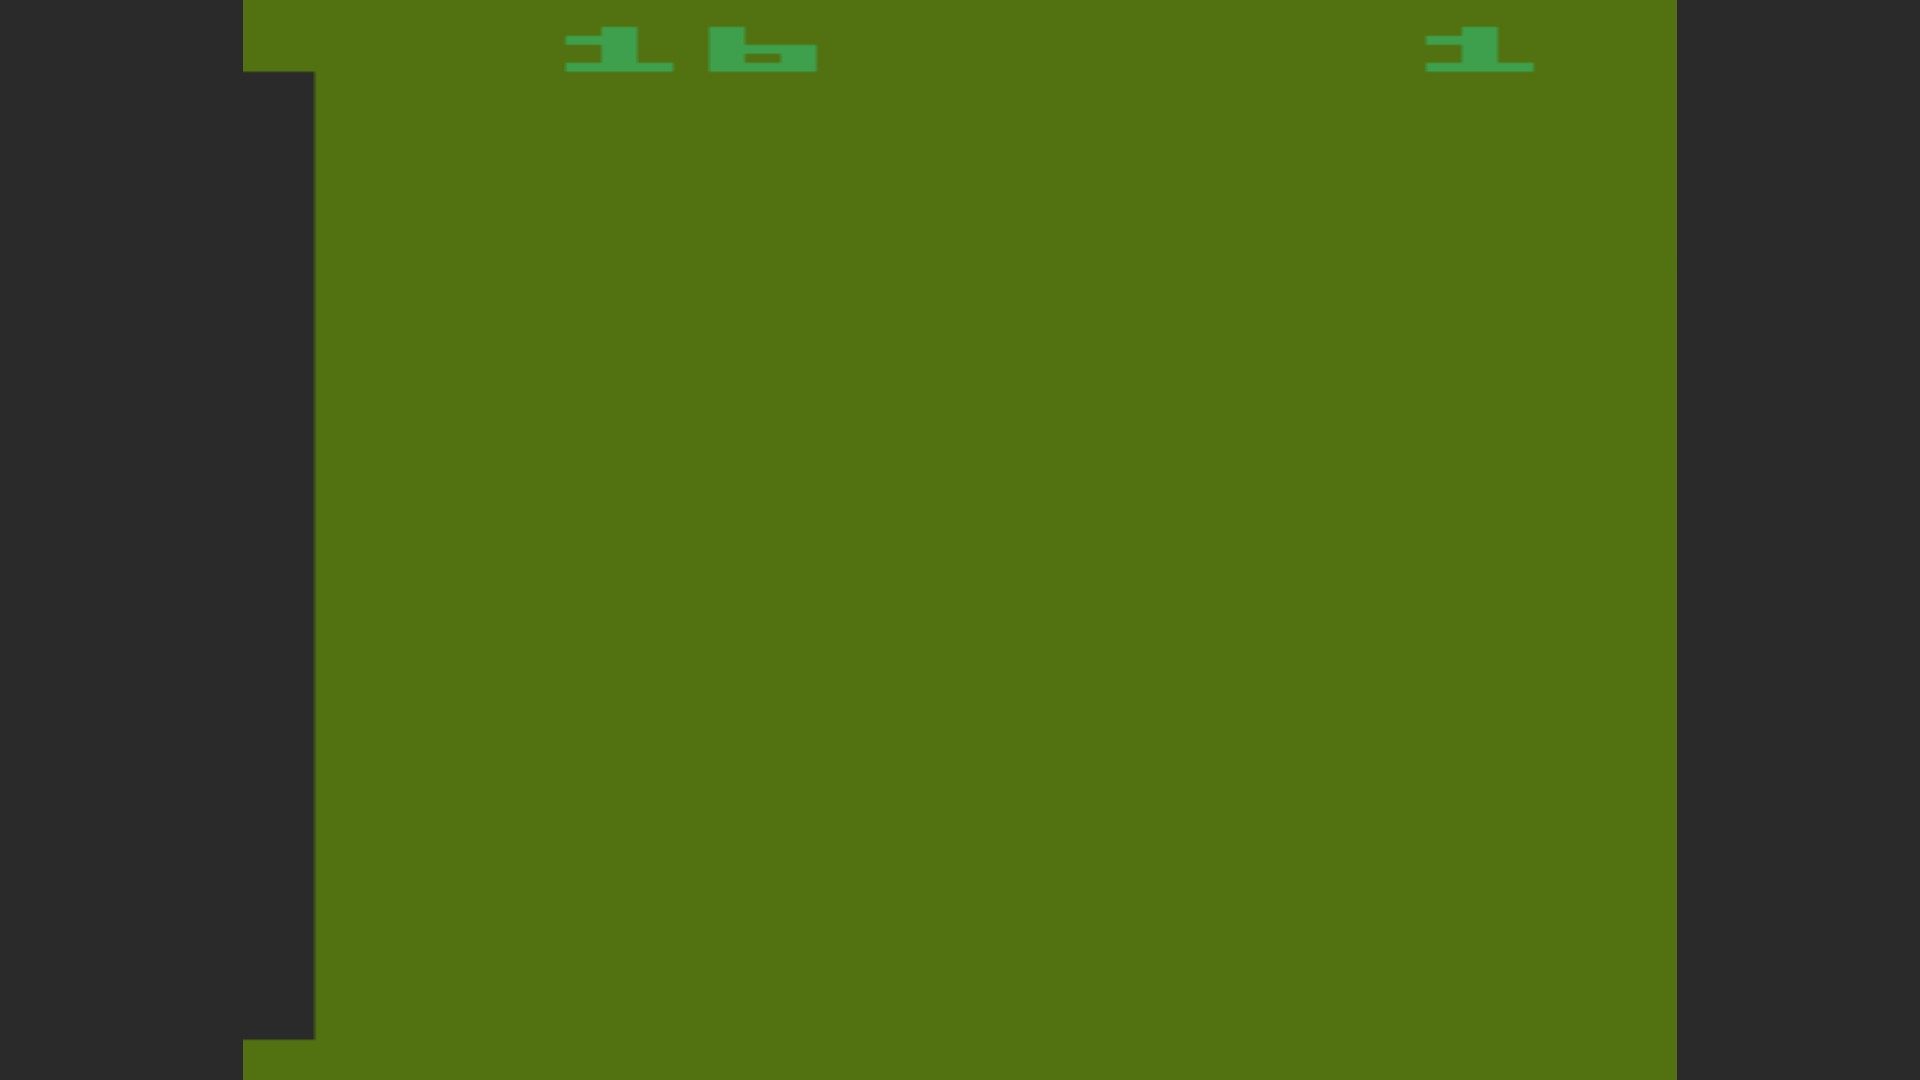 AkinNahtanoj: Asteroids: Game 16 (Atari 2600 Emulated Novice/B Mode) 8,010 points on 2020-10-11 13:46:43